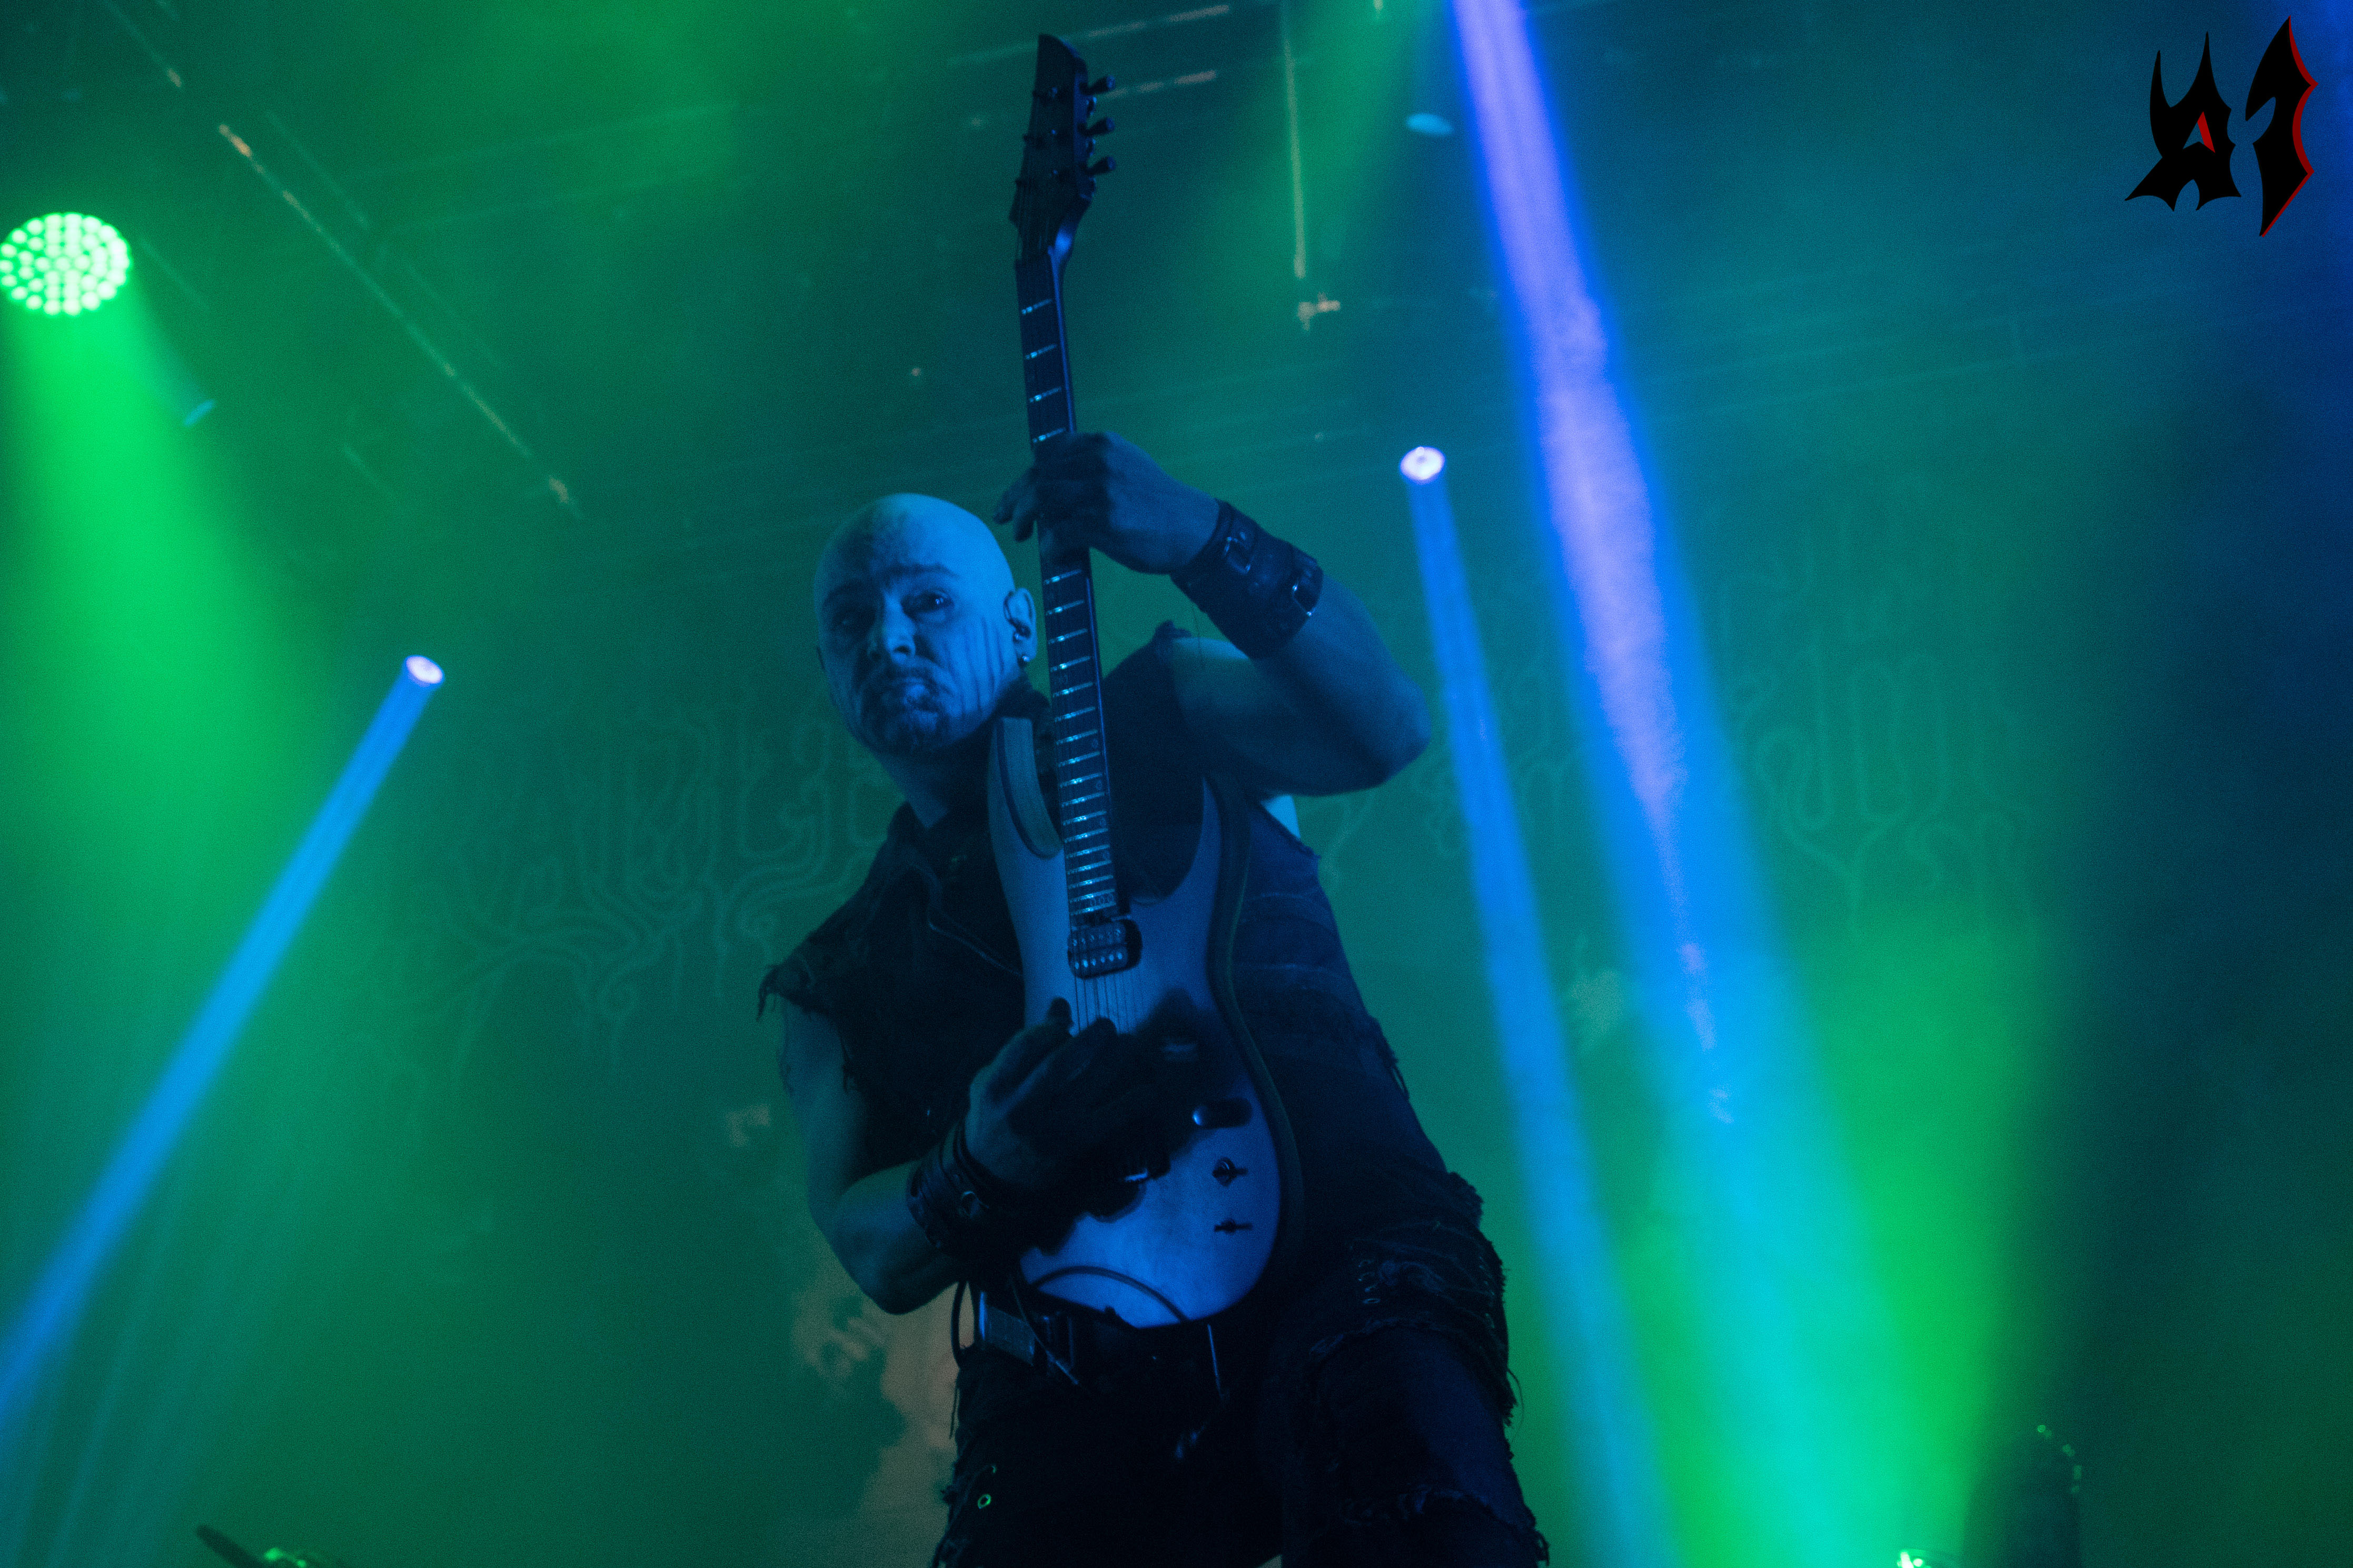 Hellfest - Cradle Of Filth - 18